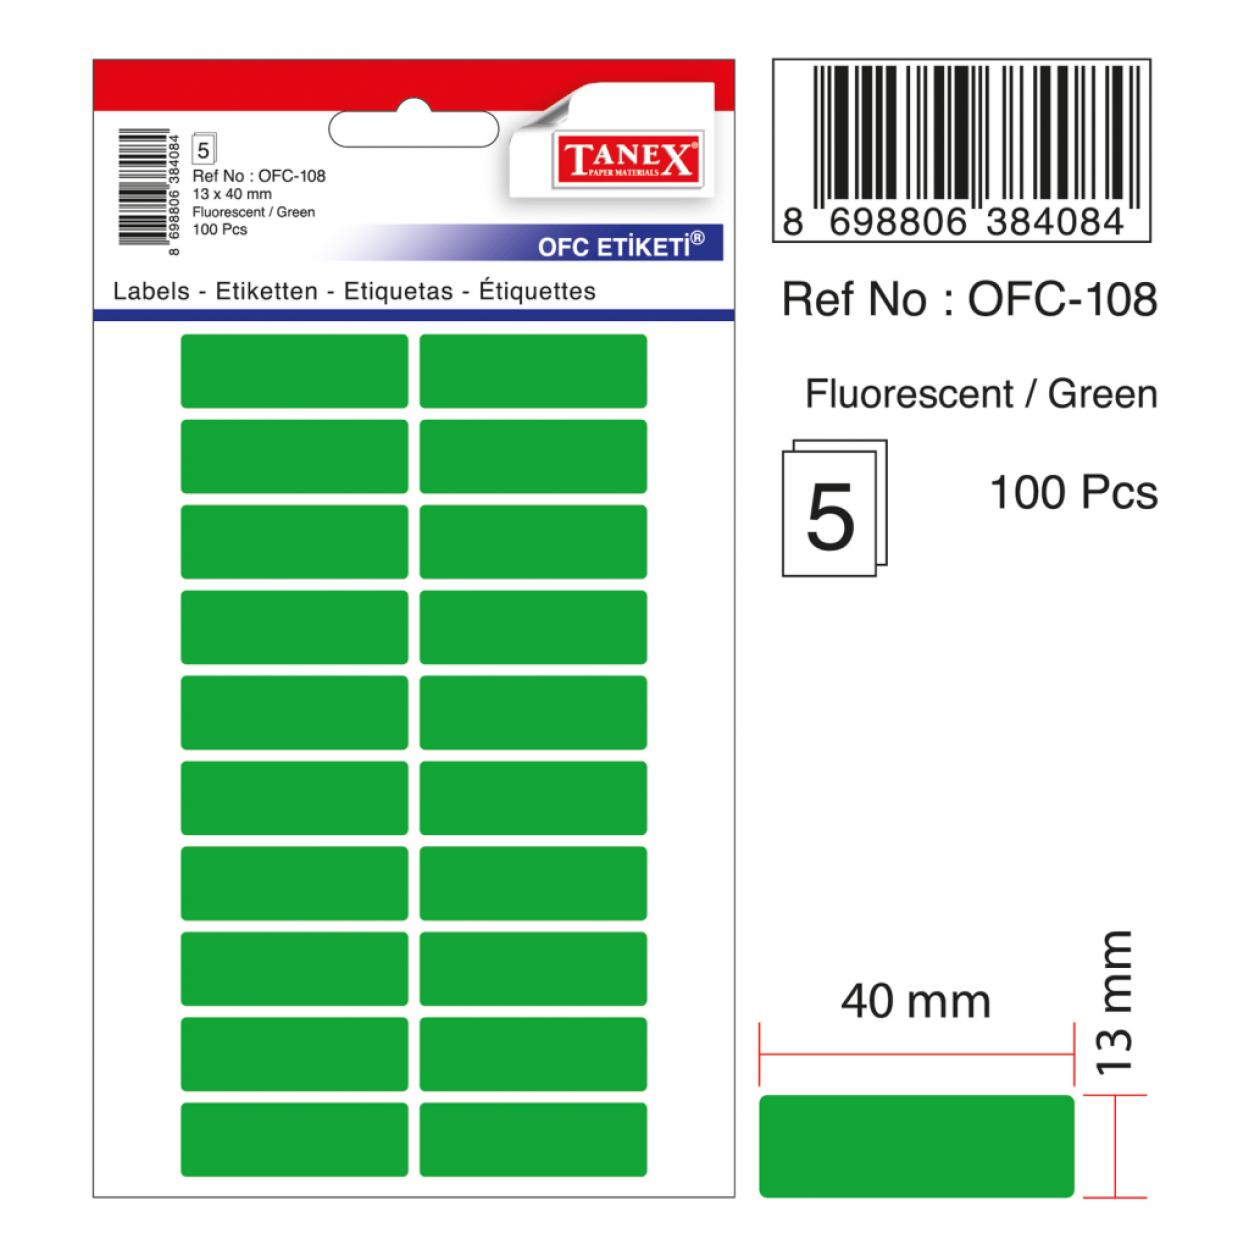 Tanex Ofc-108 Yeşil Ofis Etiketi